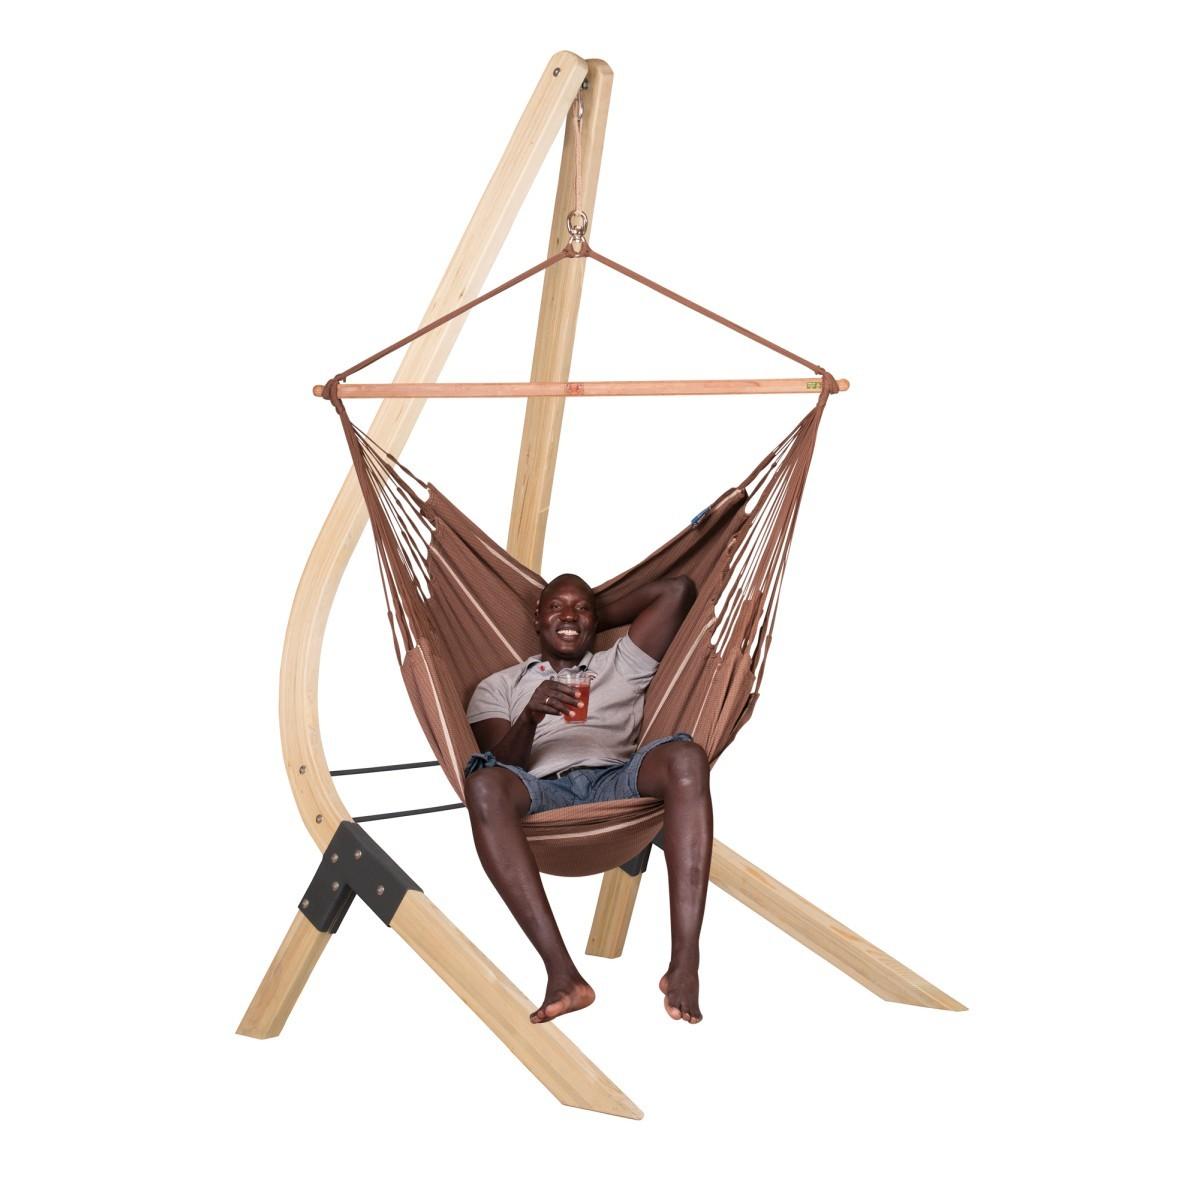 la siesta chaise hamac lounger habana chocolate support en bois vela. Black Bedroom Furniture Sets. Home Design Ideas